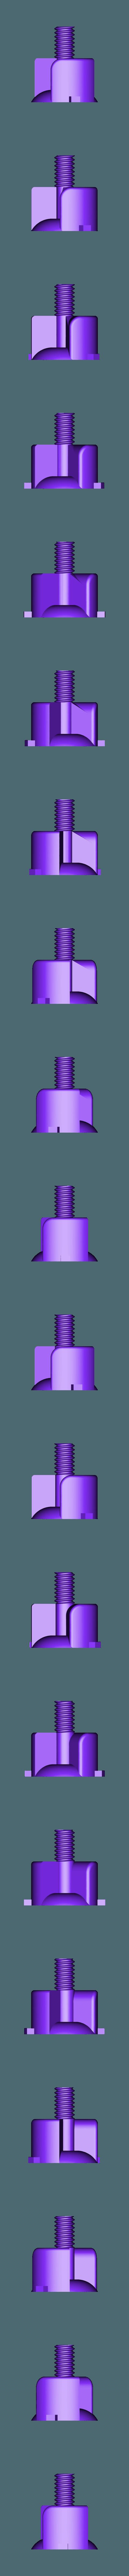 Universal Camera Holder.stl Download free STL file Adjustable Tripod (FULLY 3D PRINTED) • 3D printing design, samsuchin